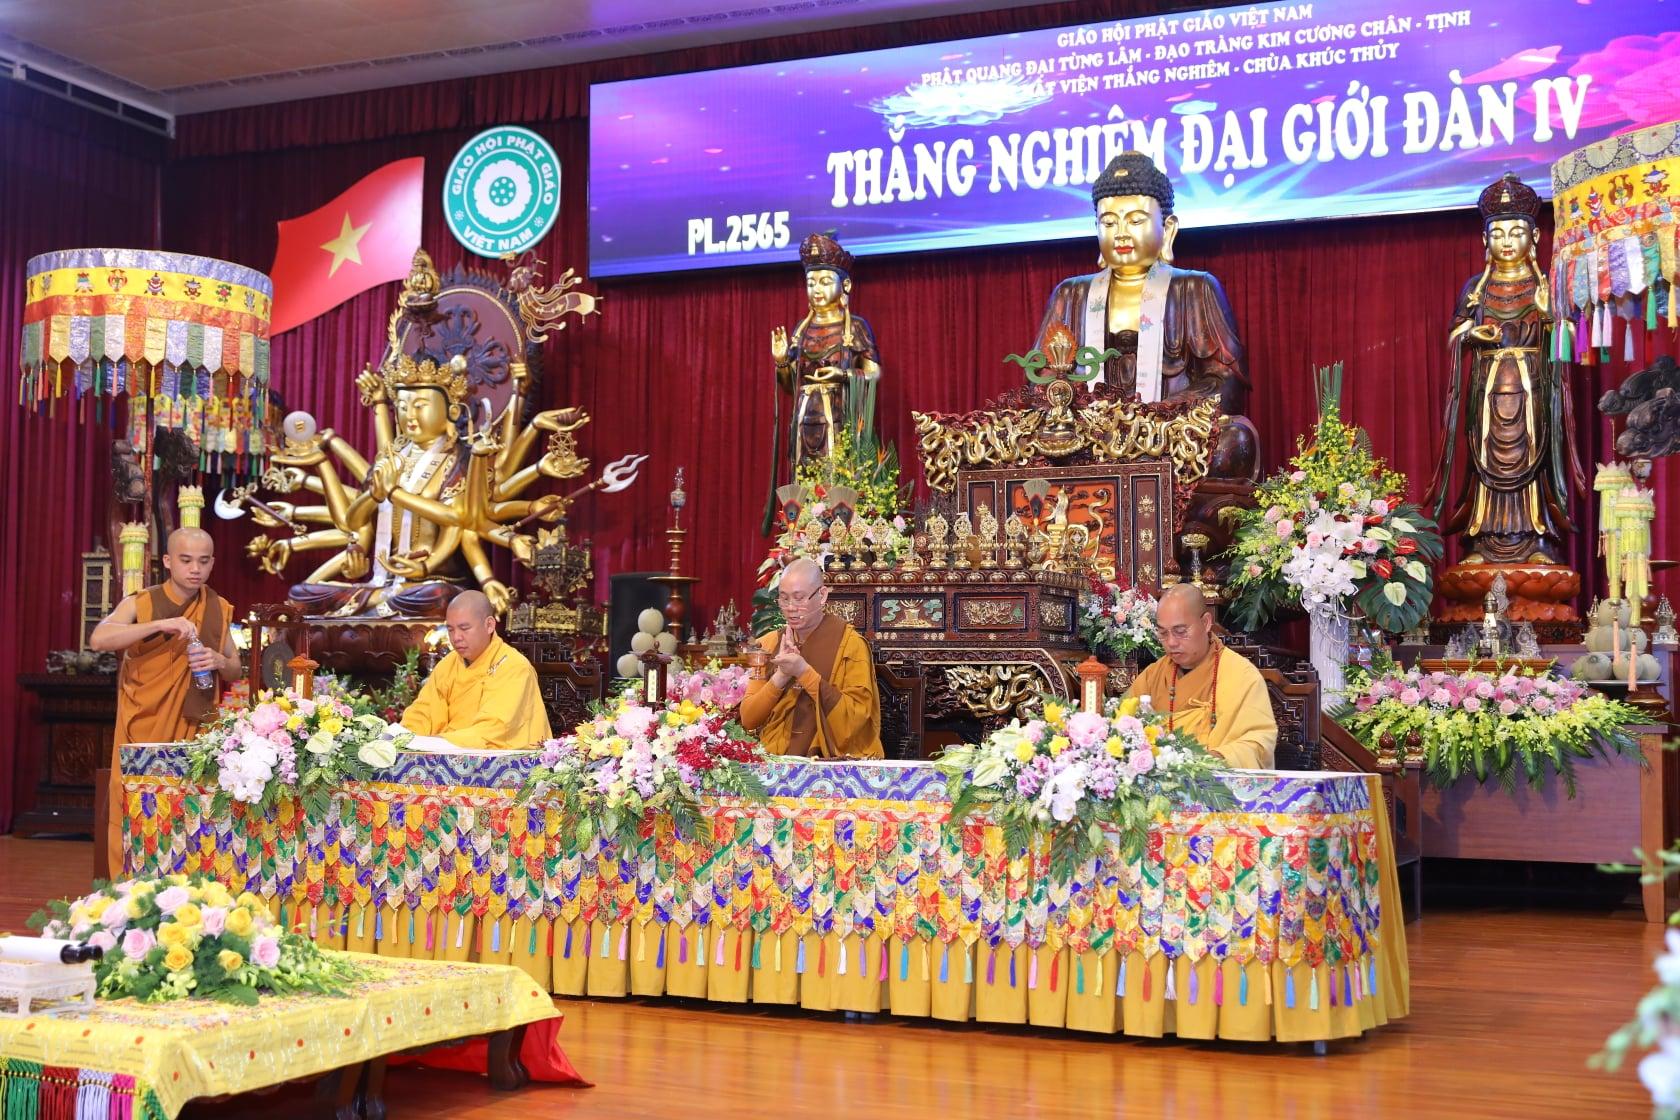 Thang Nghiem Dai Gioi Dan IV (131)